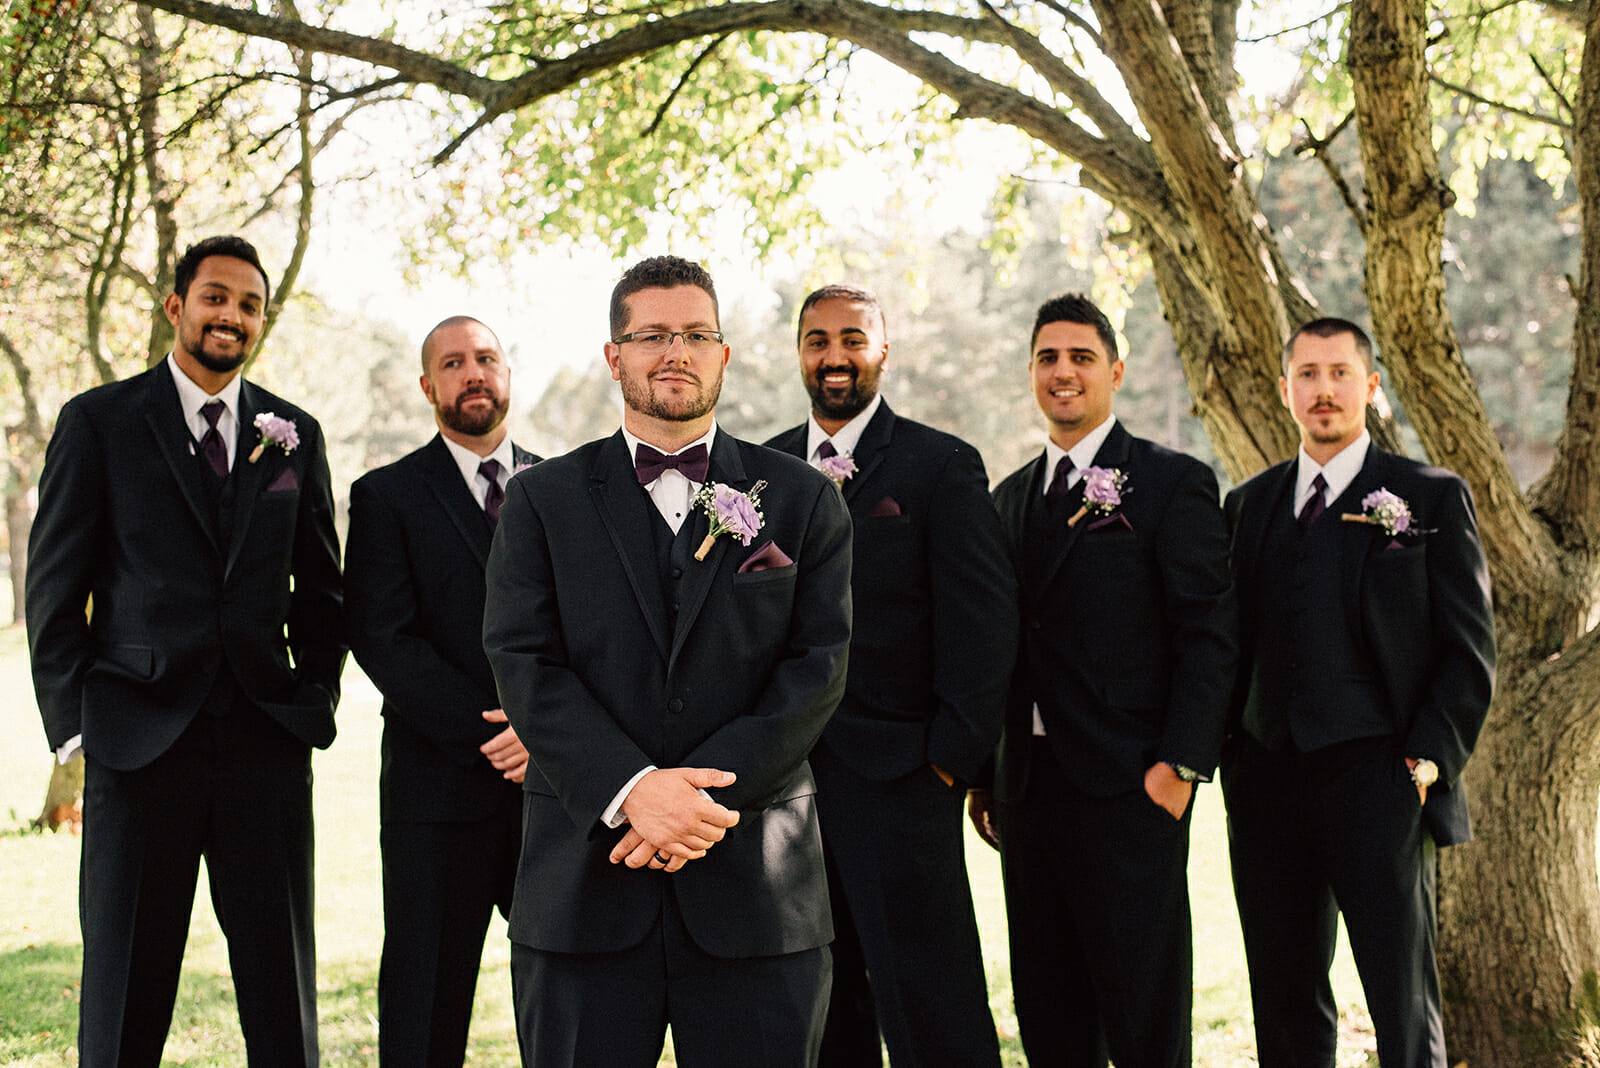 groomsmen photos at oshawa golf course